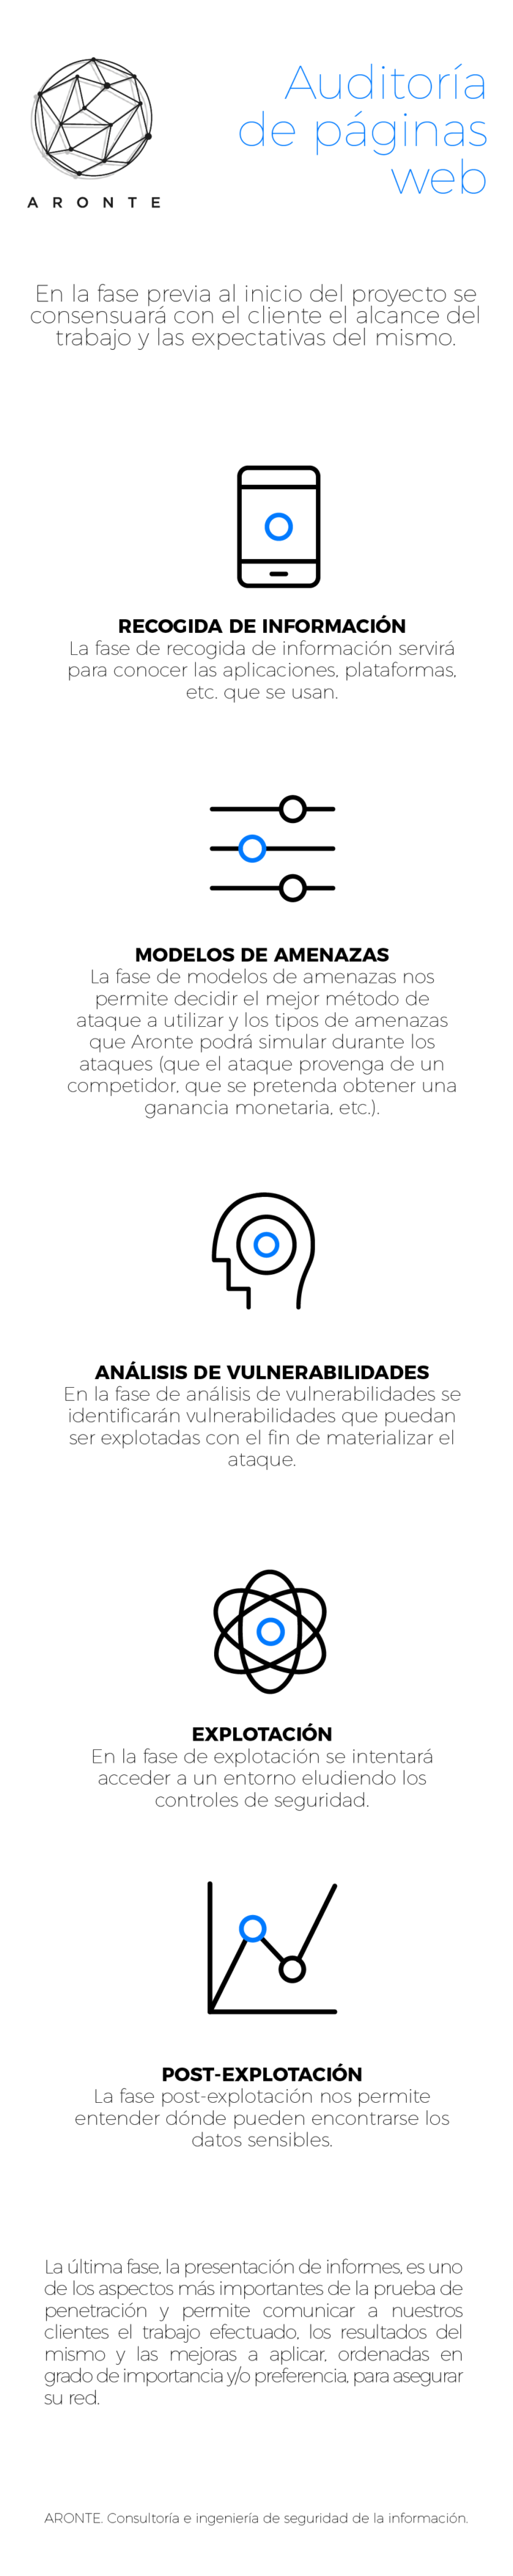 infografia_AUDITORiA_web-01